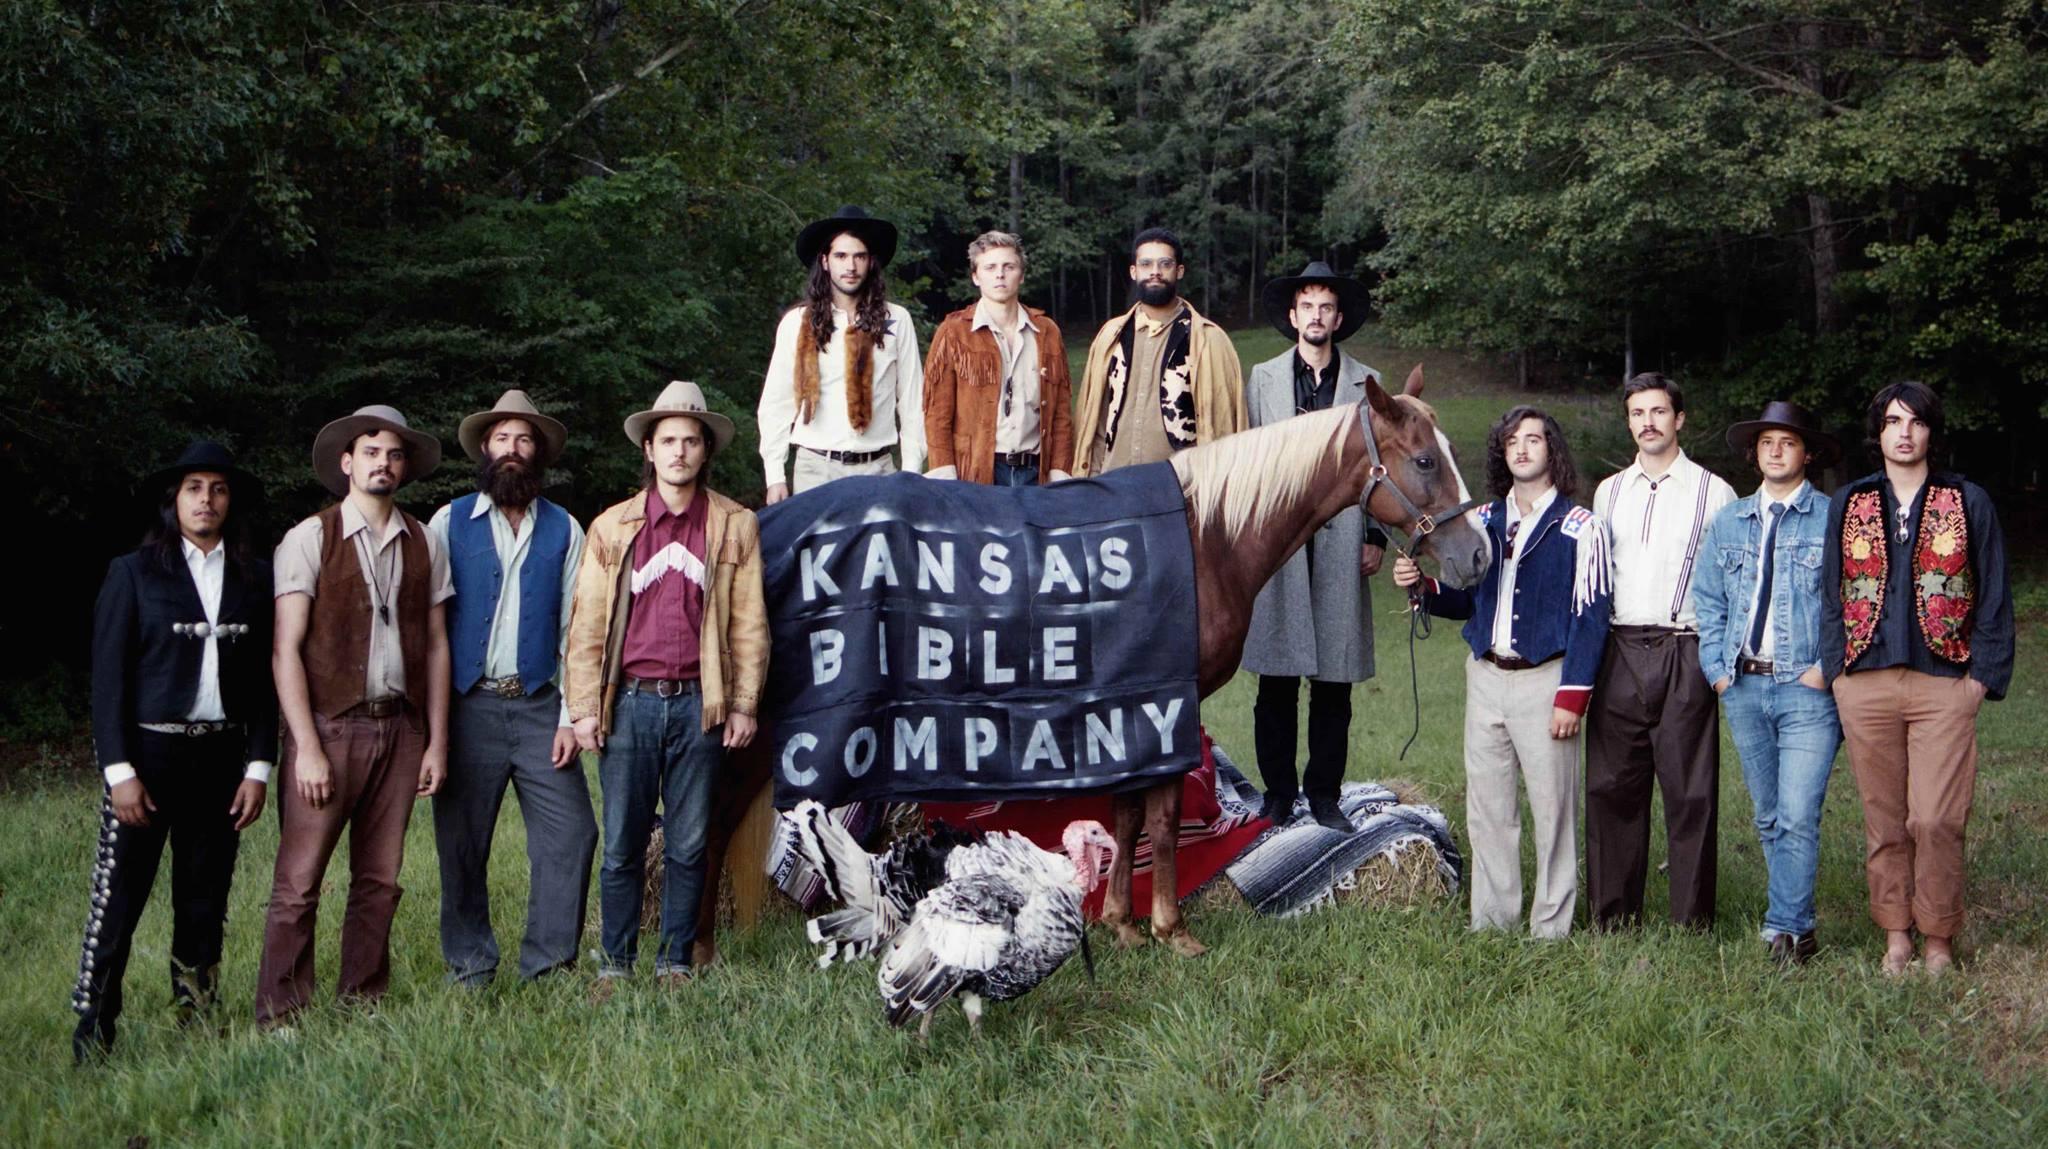 Kansas Bible Company